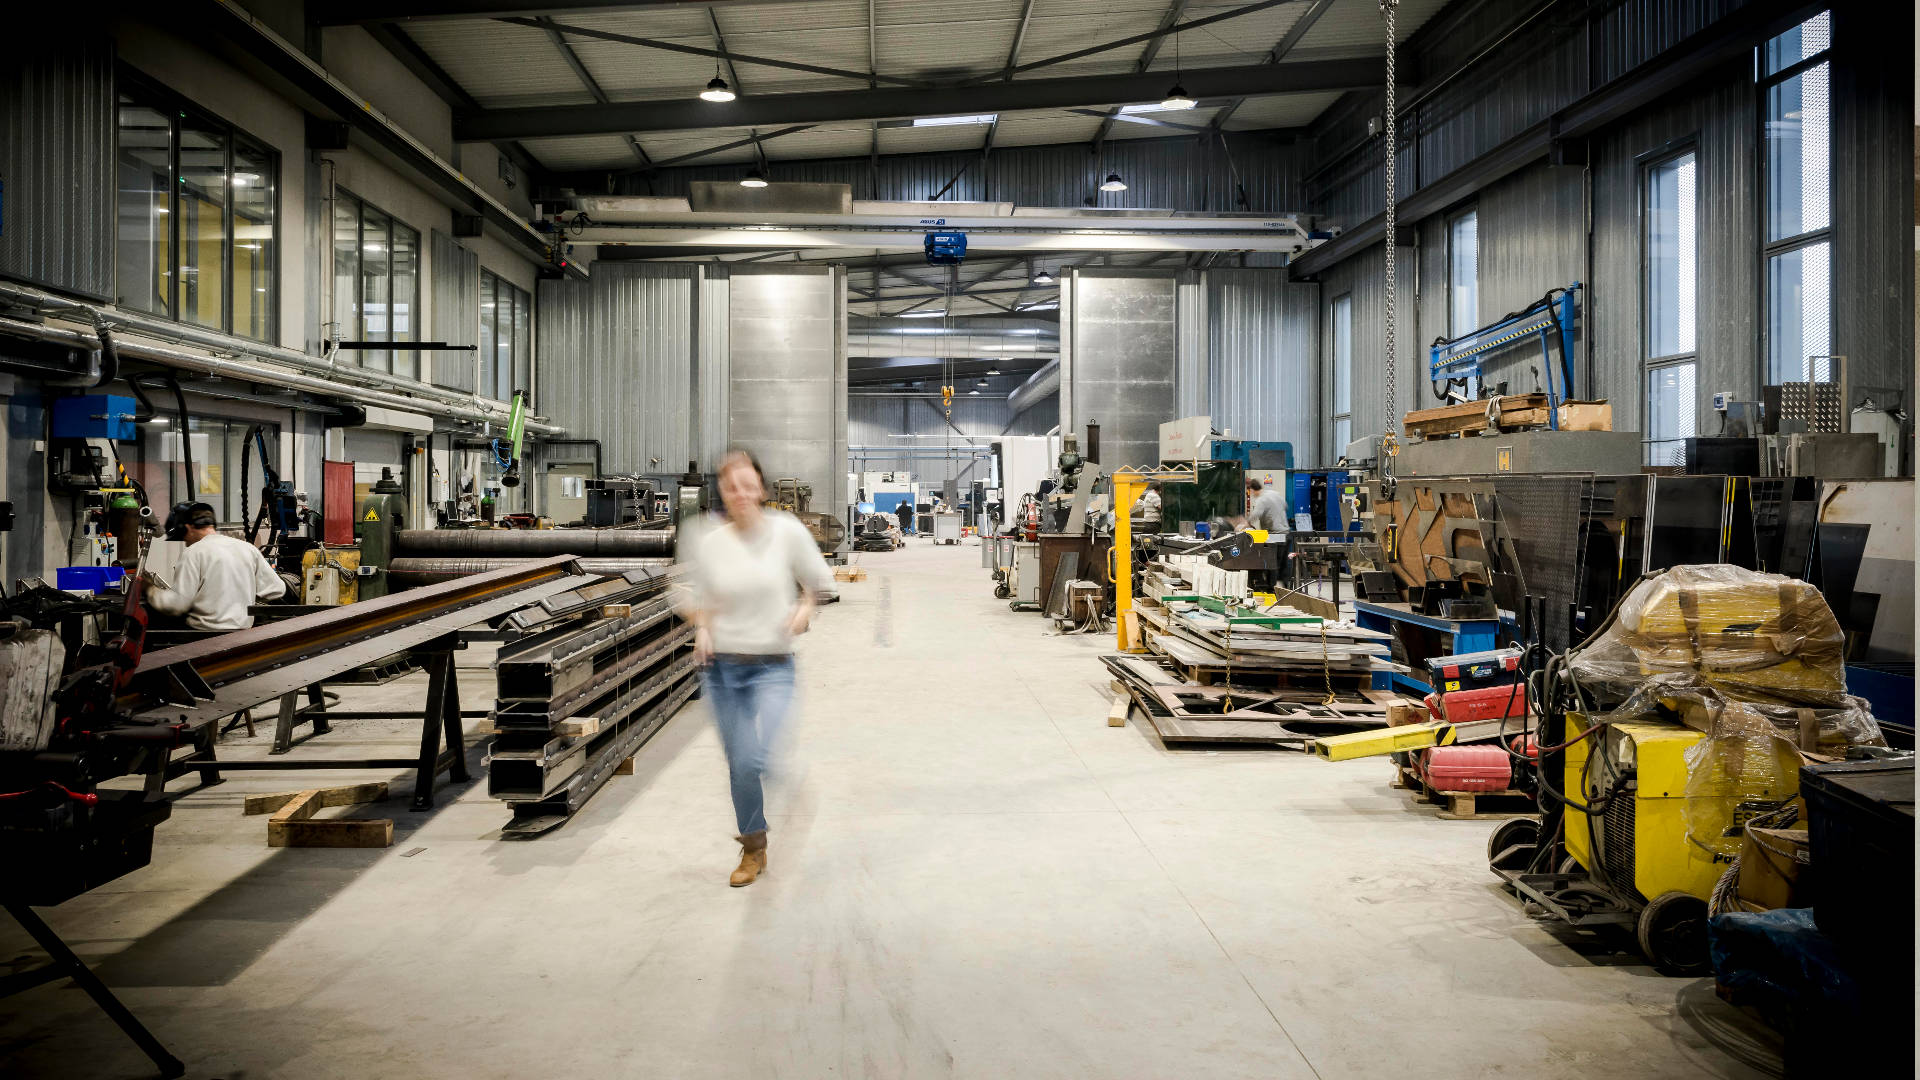 Seuil-architecture-aerem-usine-atelier-slid